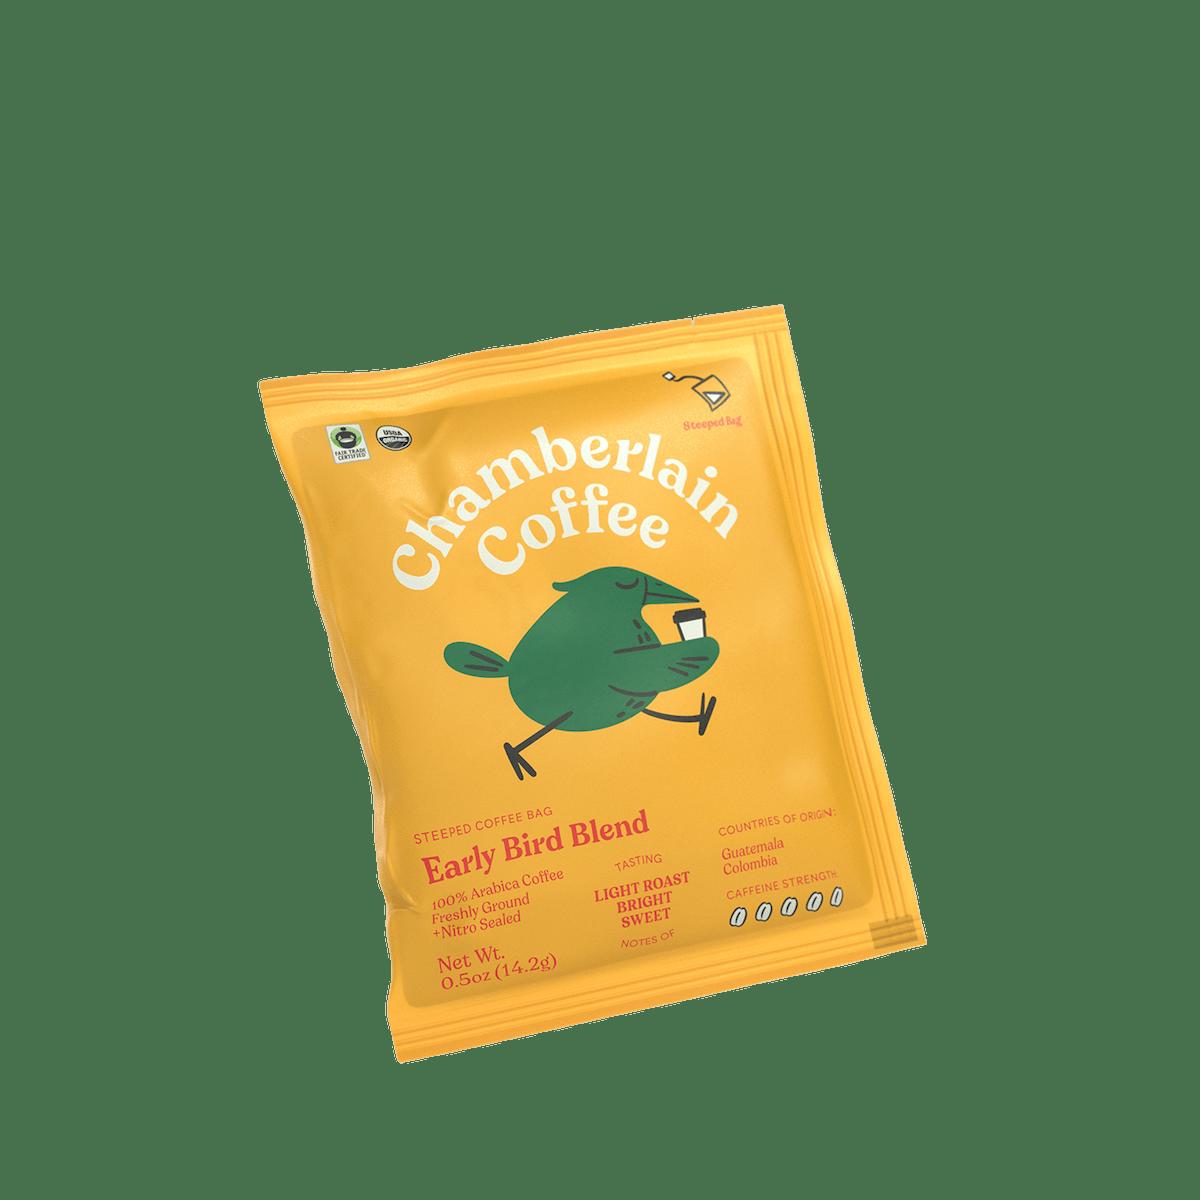 Early Bird - Chamberlain Steeped Bags